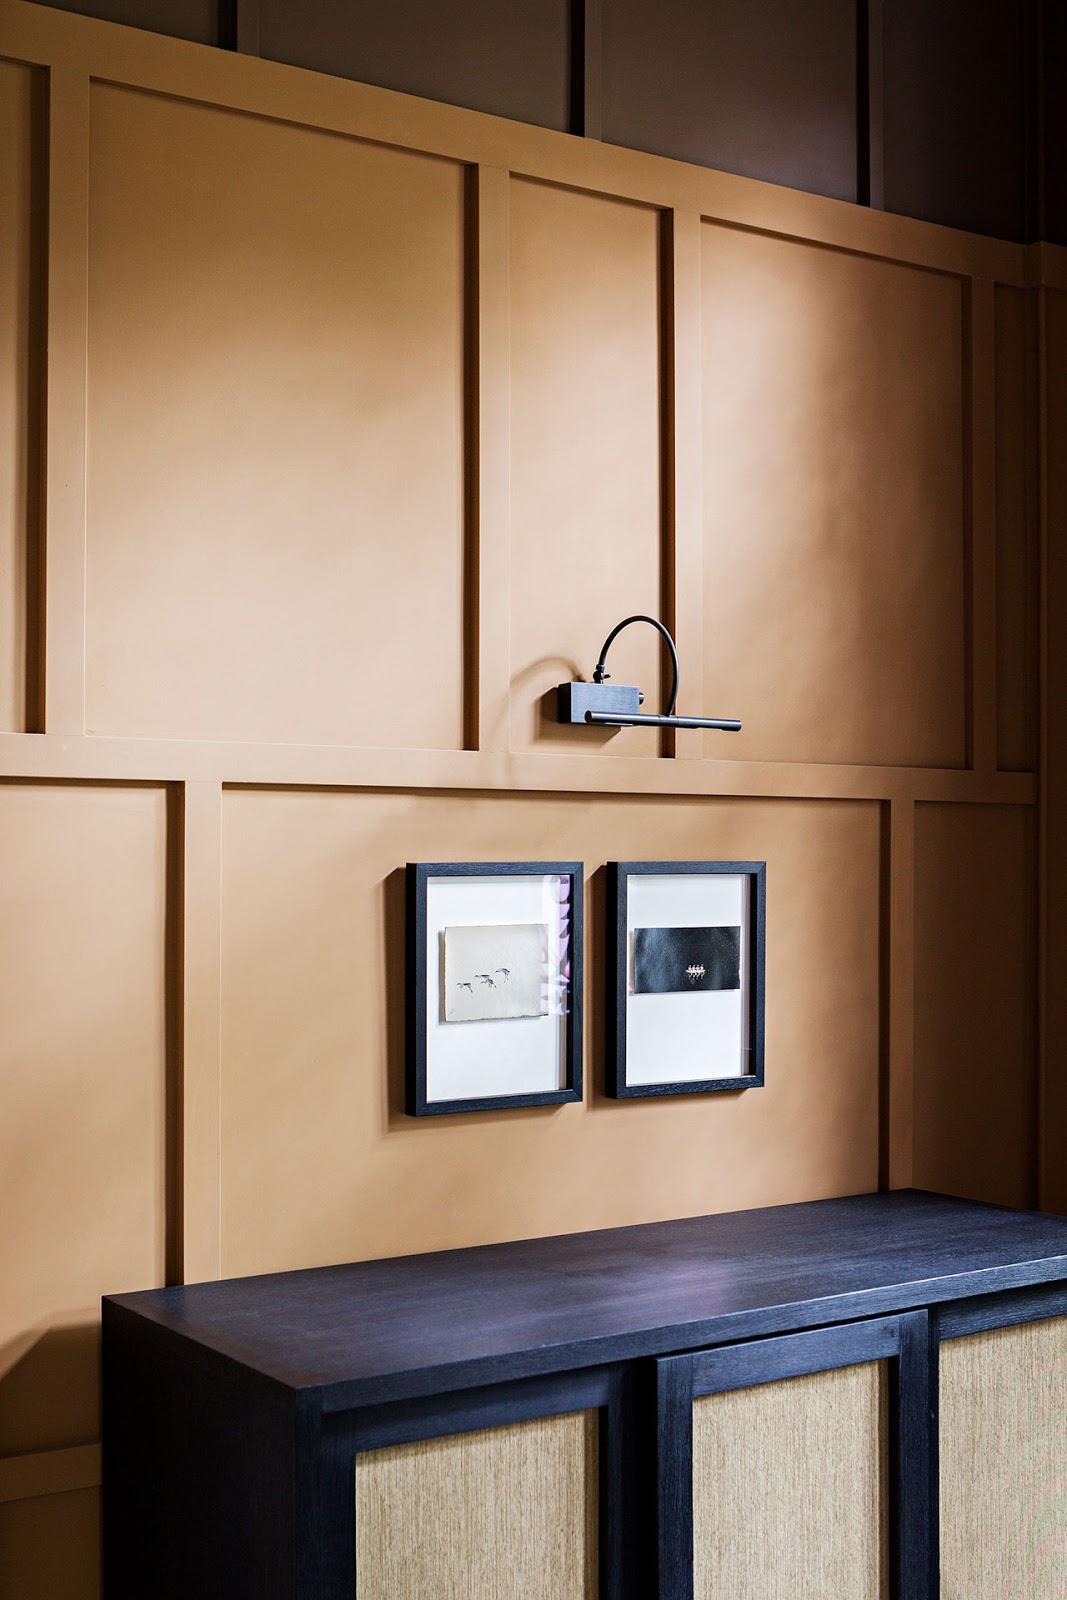 Breathtaking modern interior design in Chateau de Saint Cloud by Tristan Auer